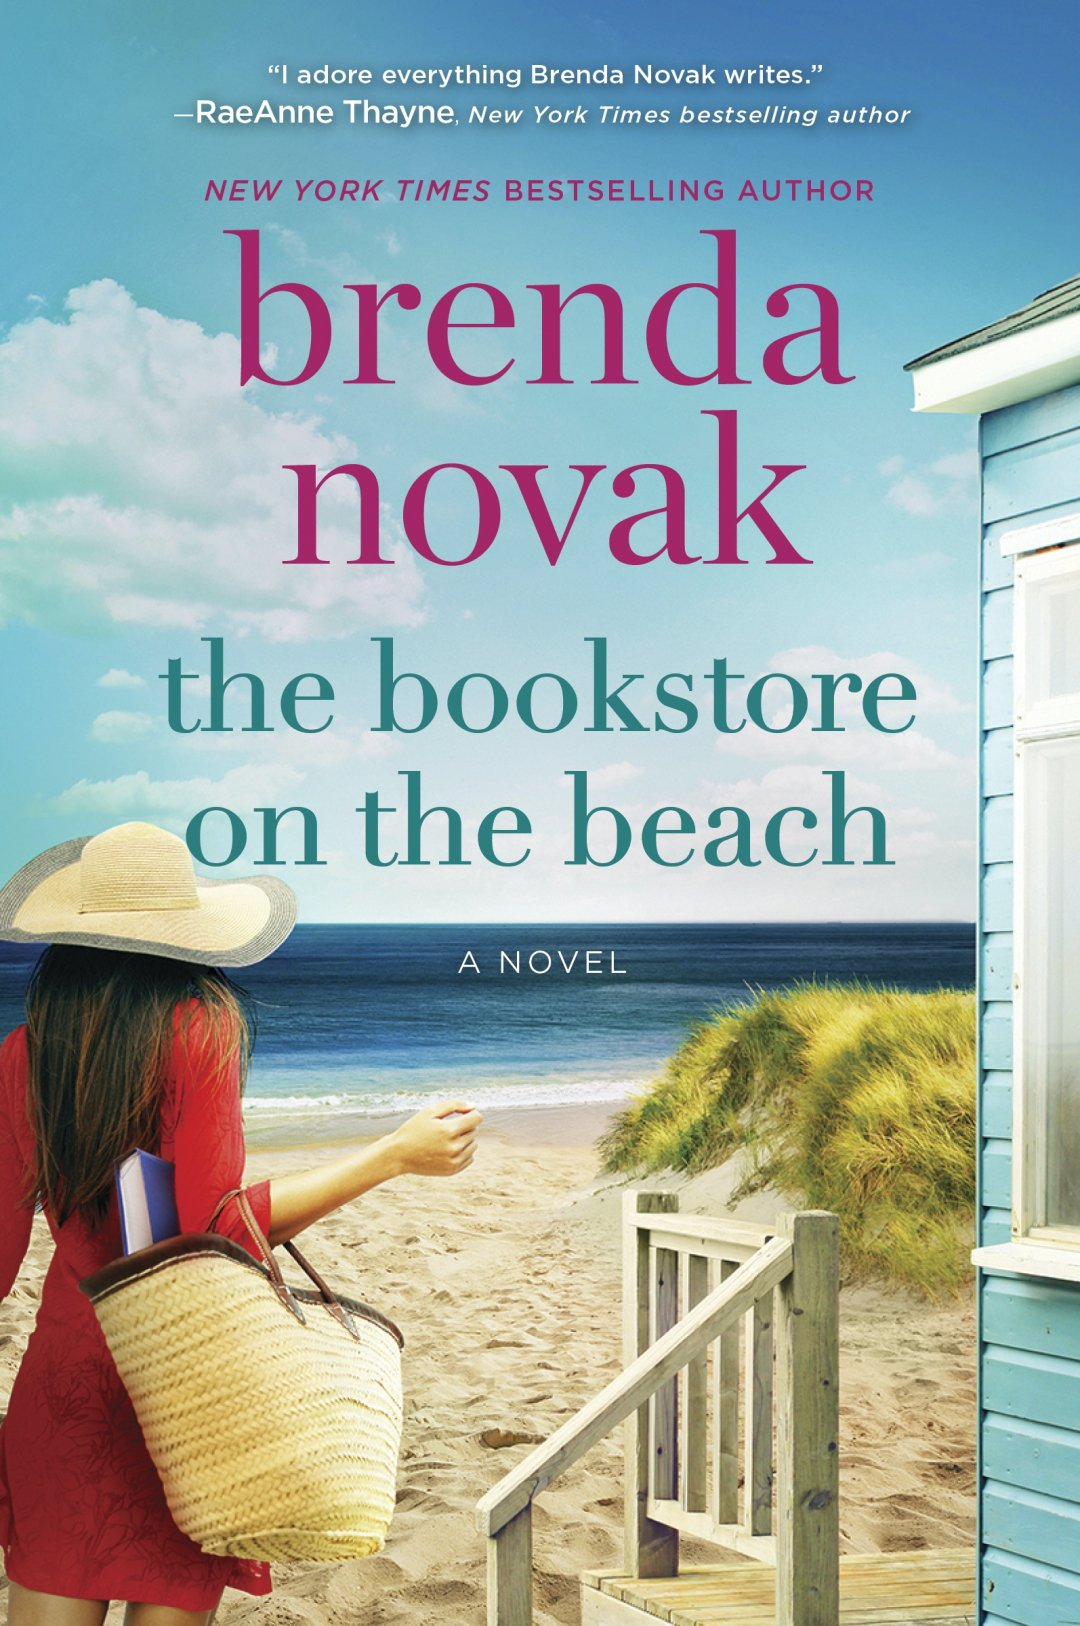 bookstore on the beach 53288455